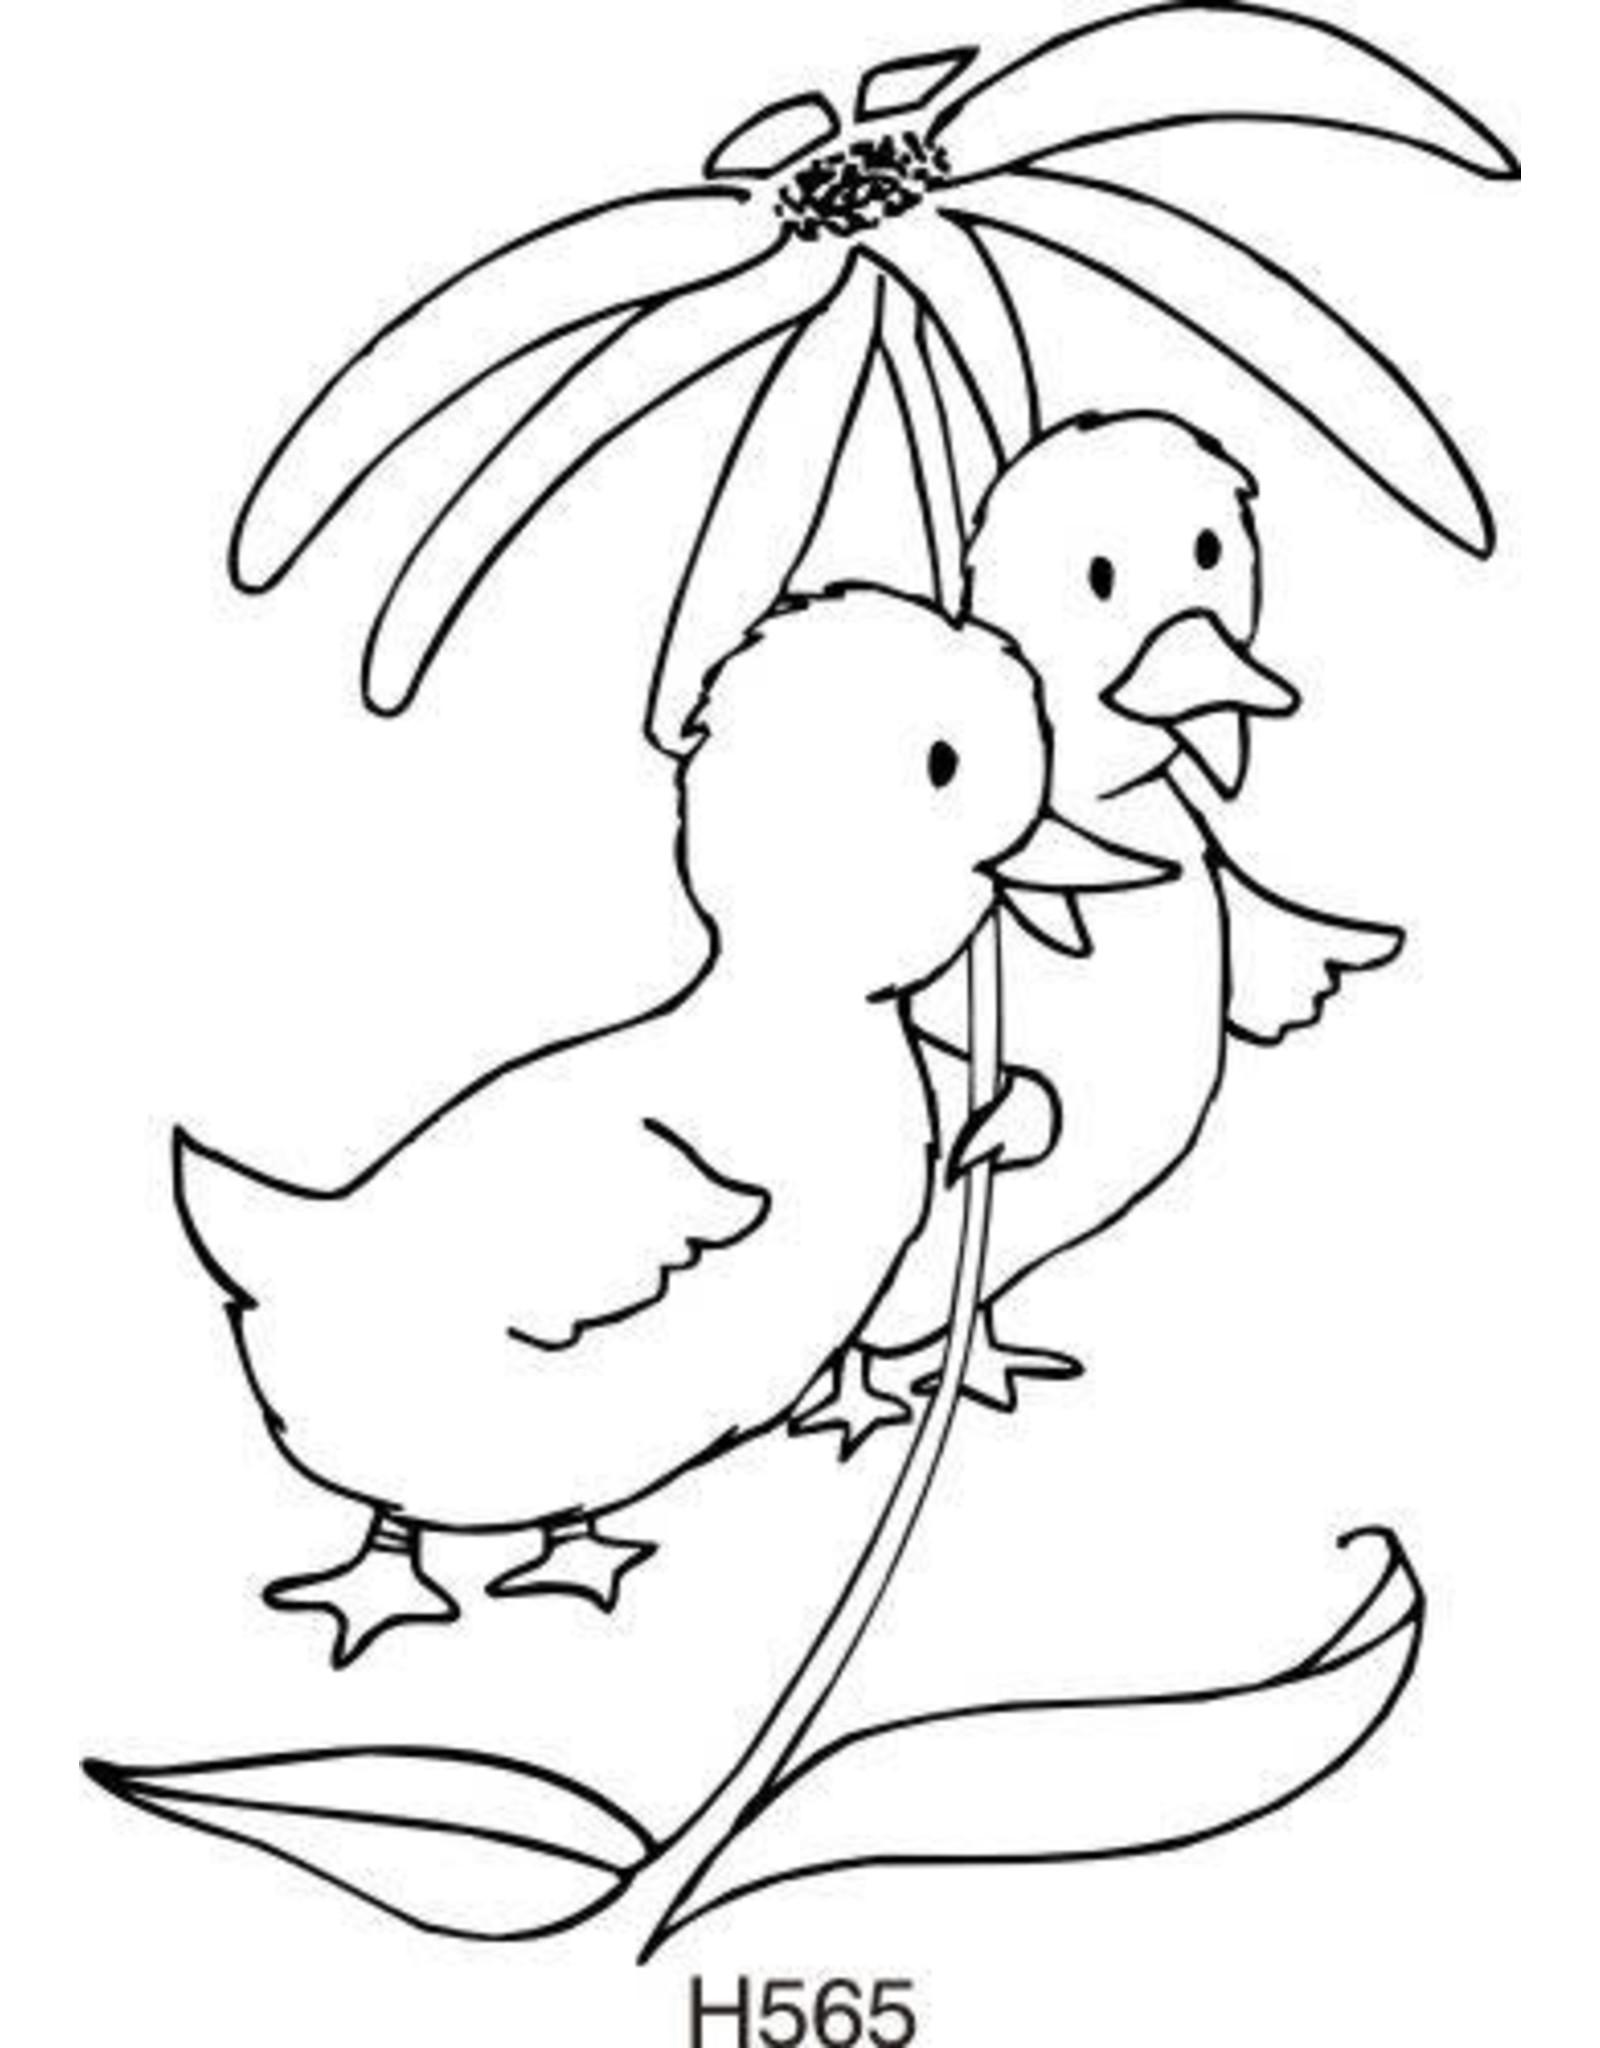 DRS Designs Ducks Decoration Cling Stamp